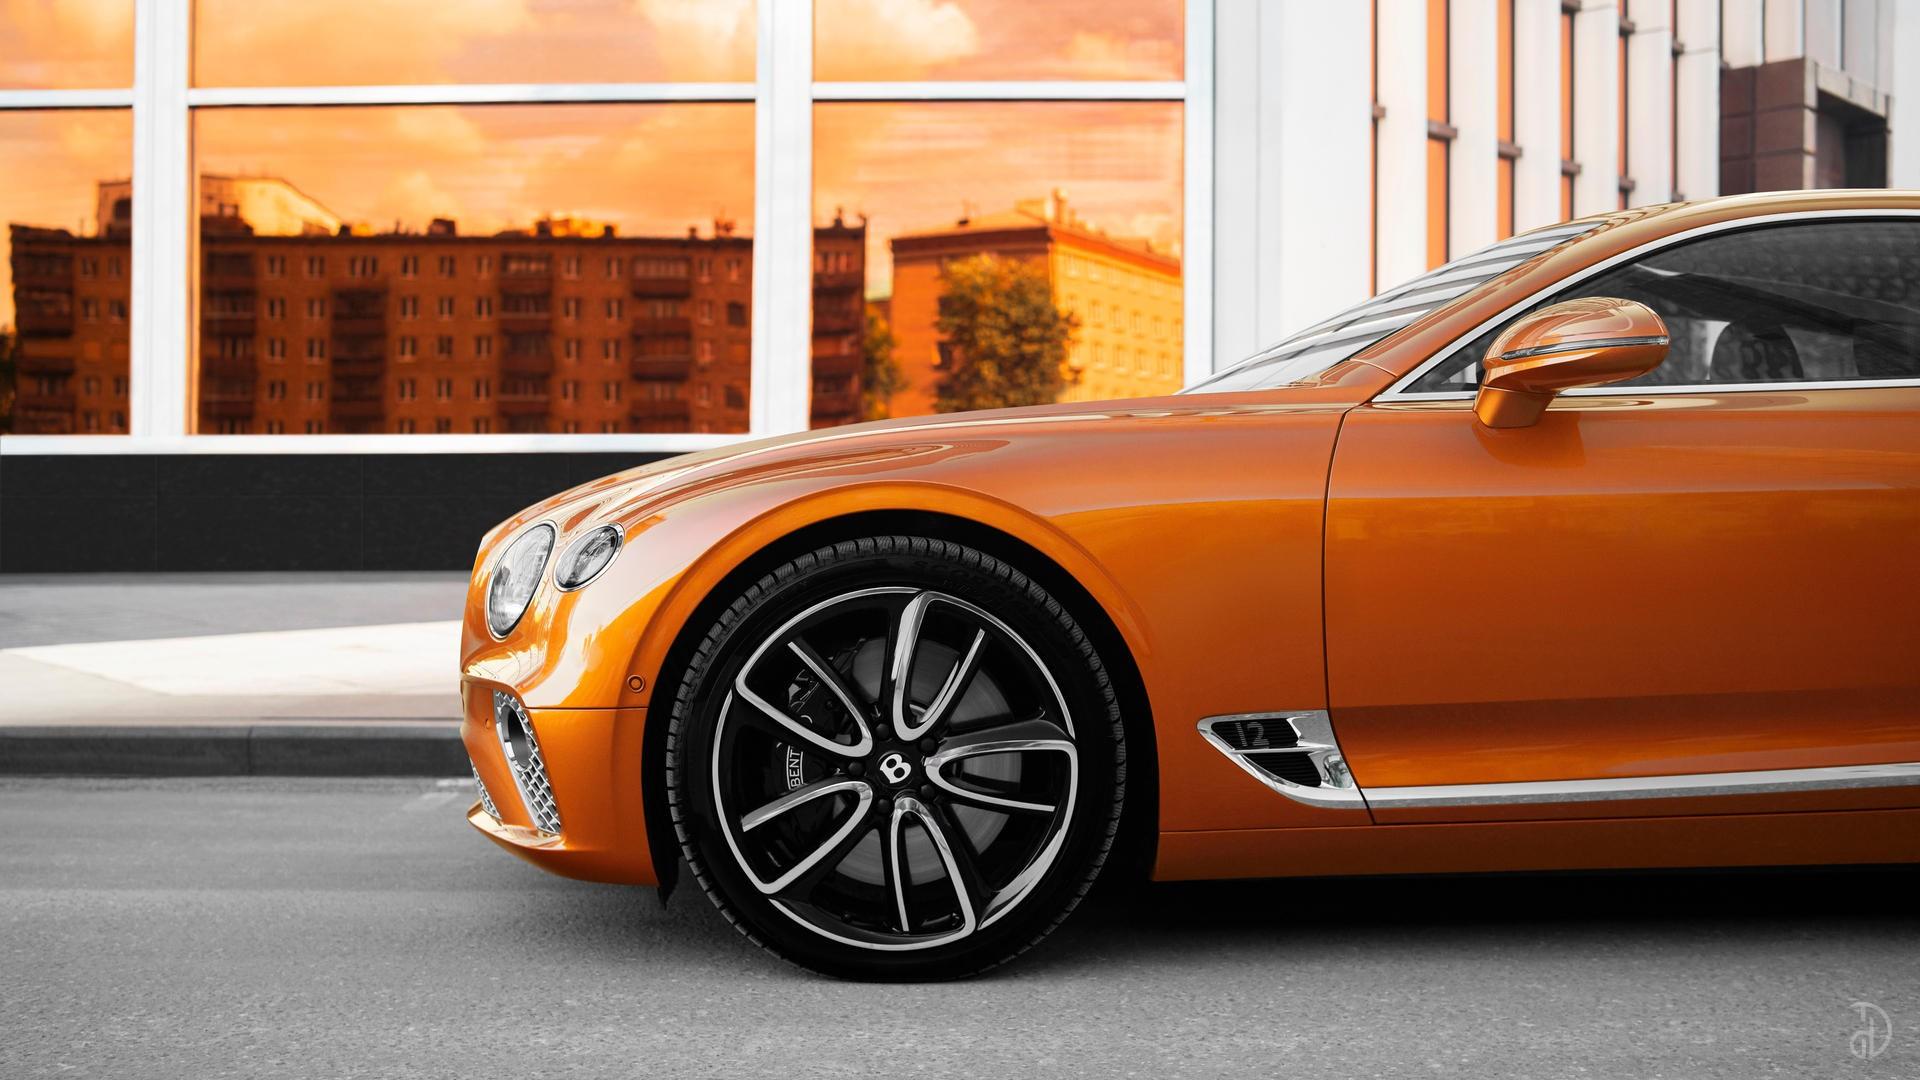 Аренда Bentley Continental GT 2020 в Сочи. Фото 3